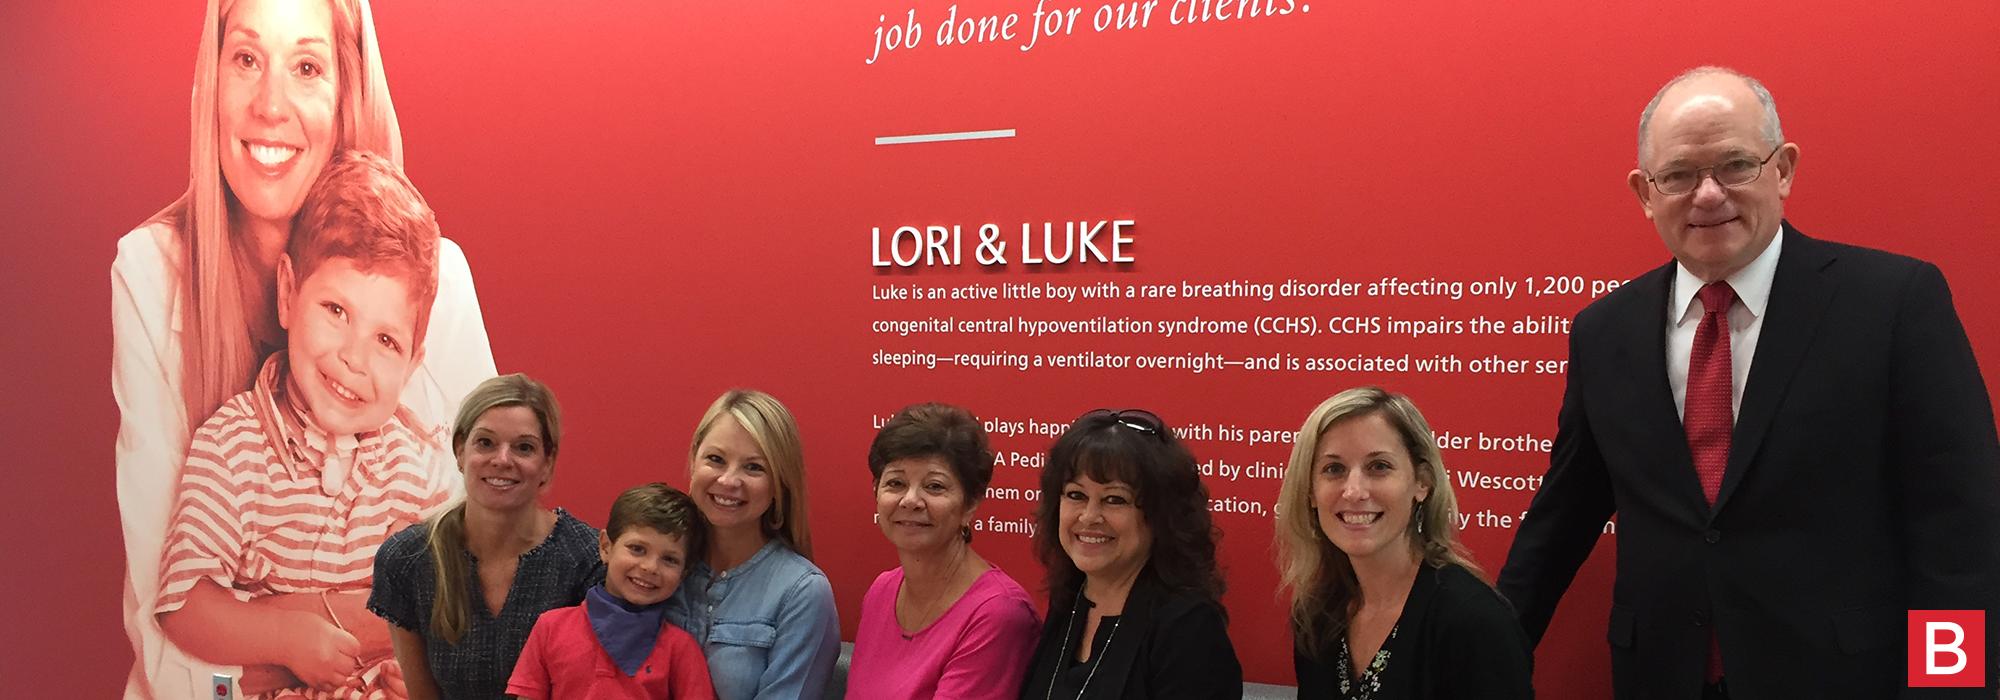 Lori, Luke and family posing with Mark Baiada at the new Pennsauken office